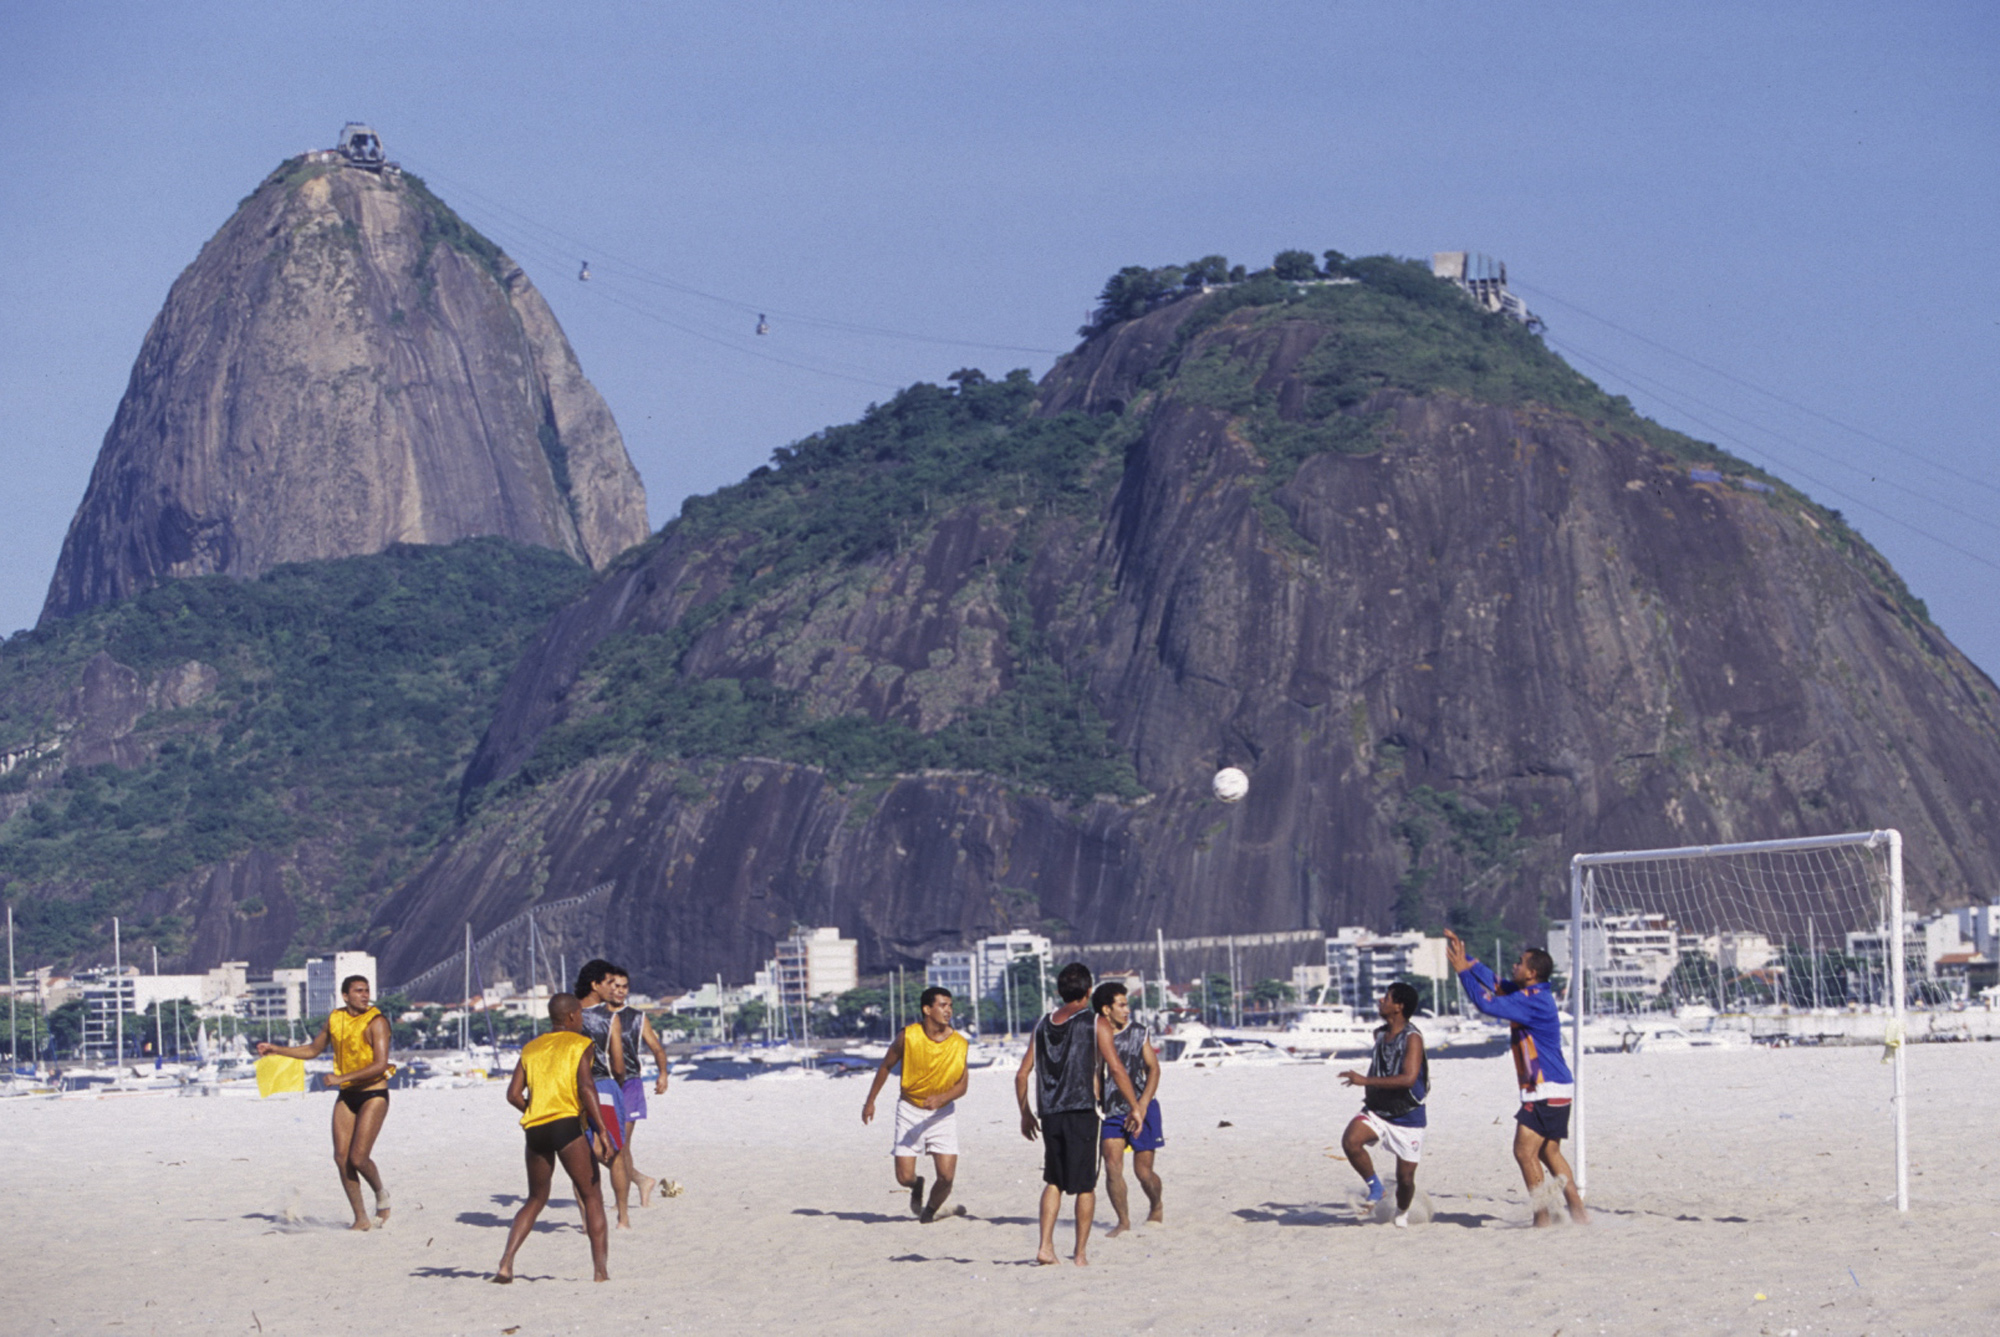 Match de football sur la plage de Botafogo (Rio de Janeiro, BRESIL, 2000) Copyright ALAIN GADOFFRE